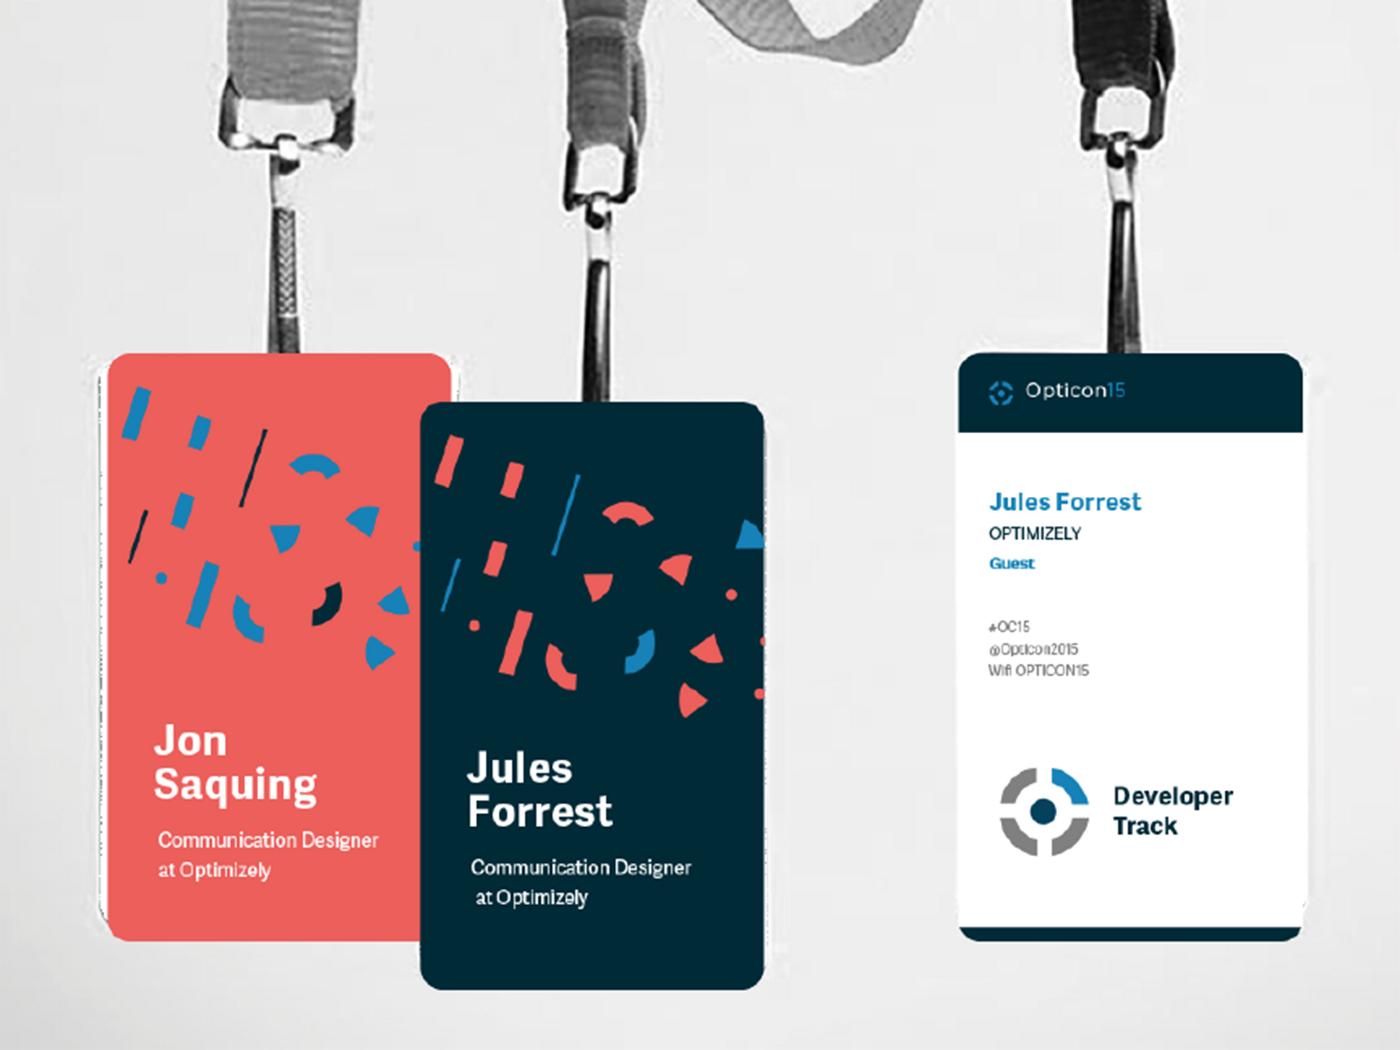 Branding Opticon | Identity card design, Name card design ...